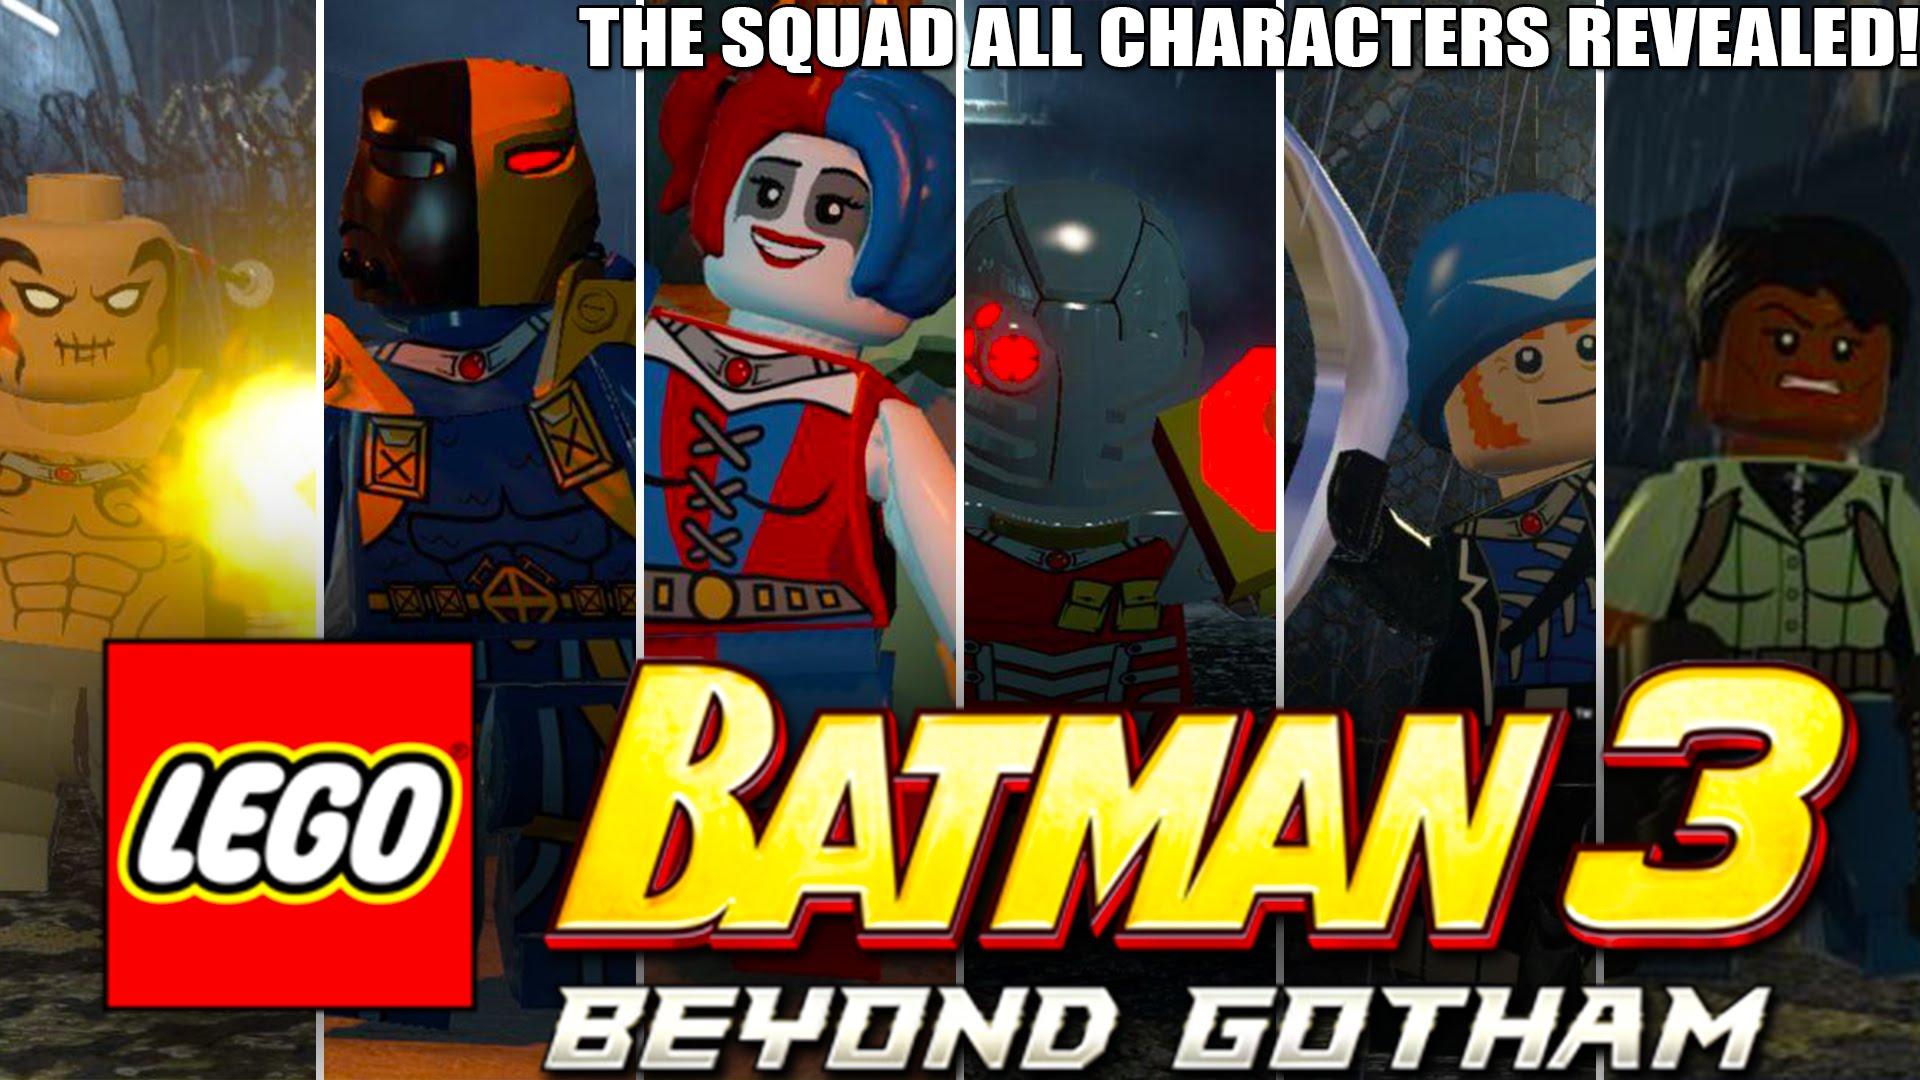 LEGO Batman 3 Beyond Gotham The Squad DLC-BAT